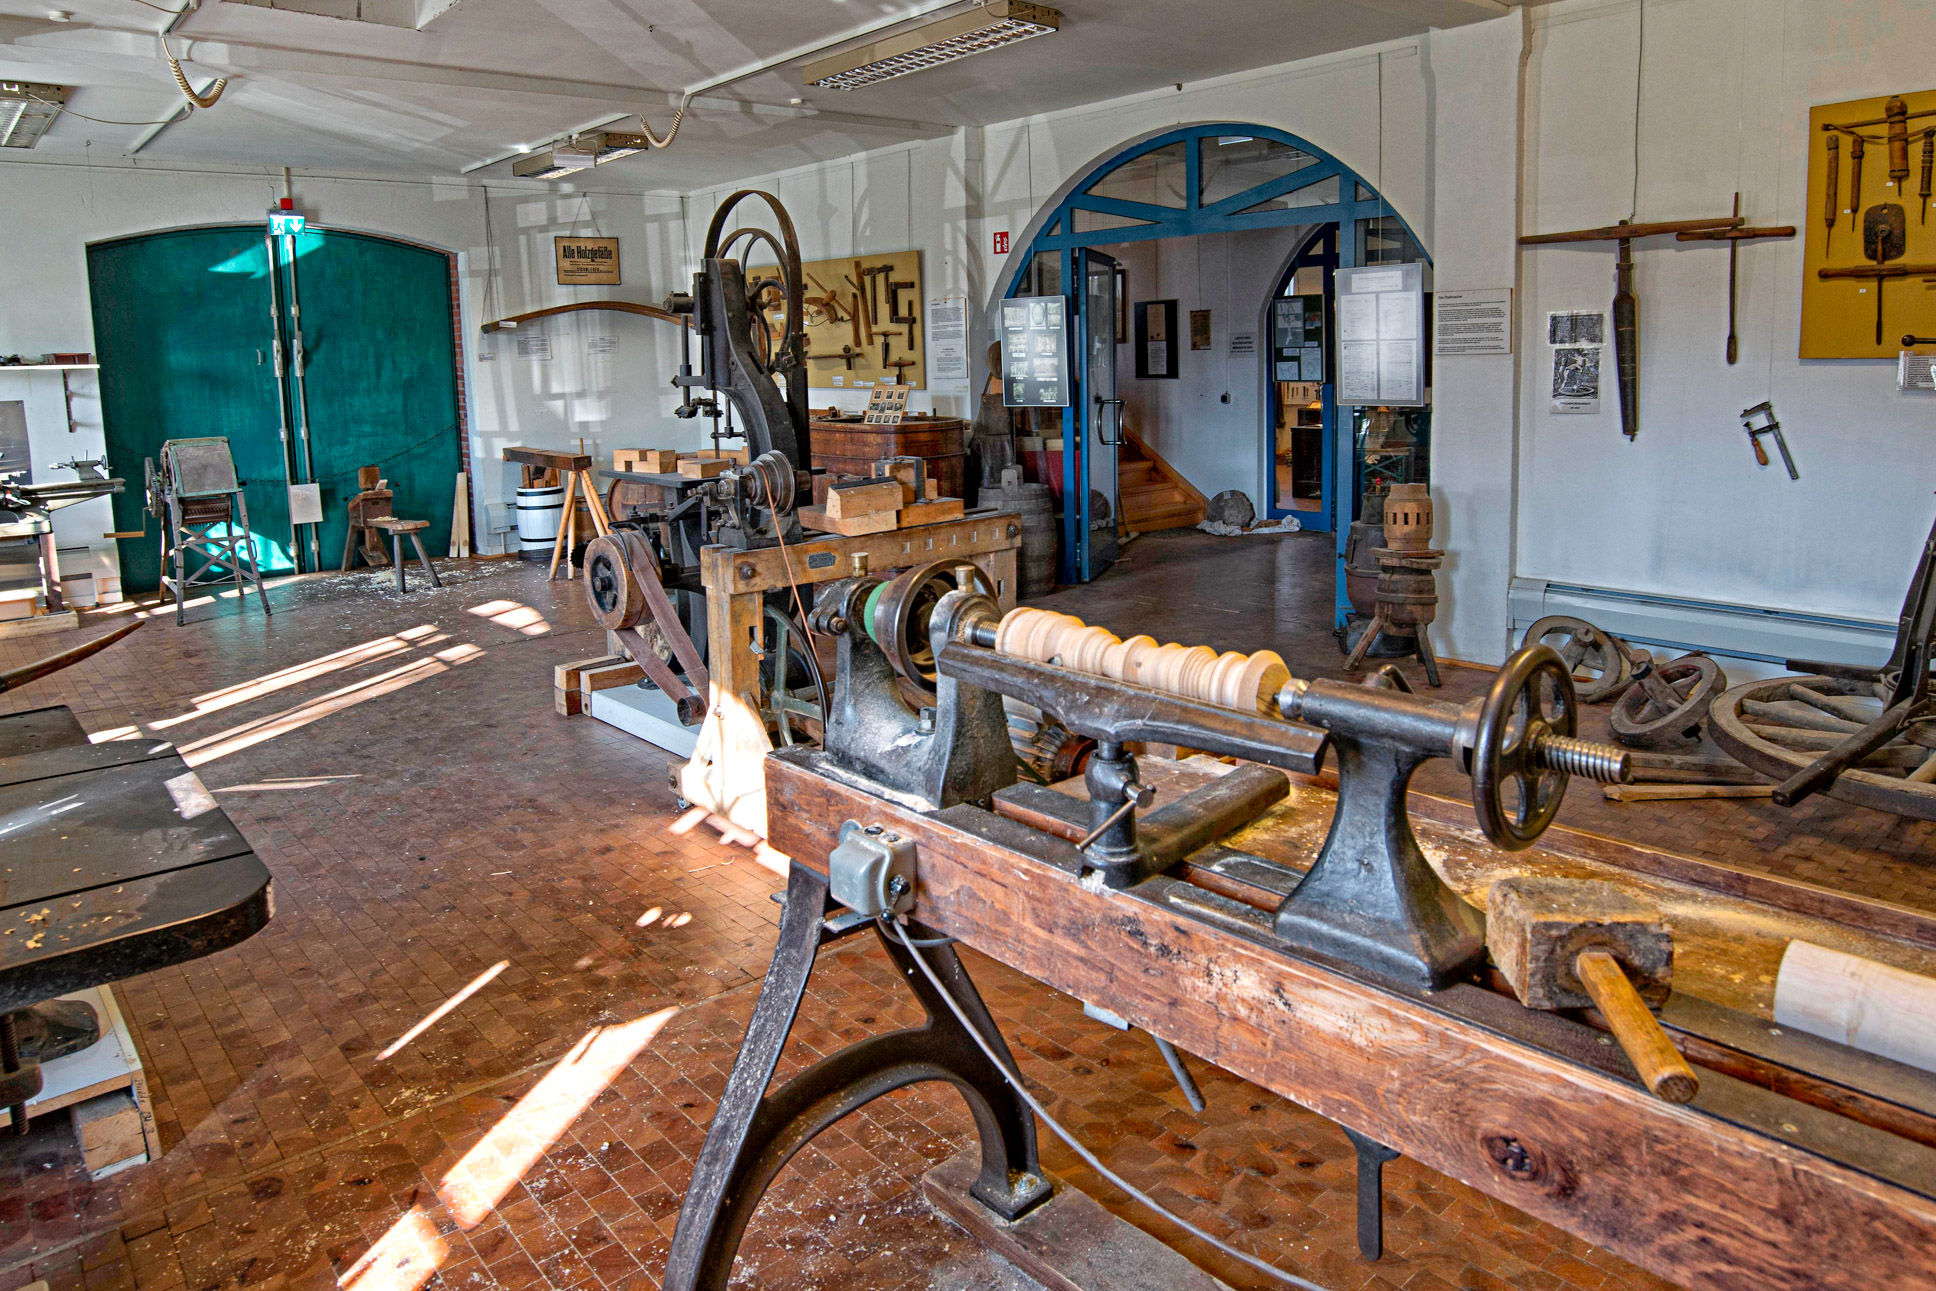 Handwerksmuseum-Horneburg-Rundgang2018-2858-Bearbeitet-21